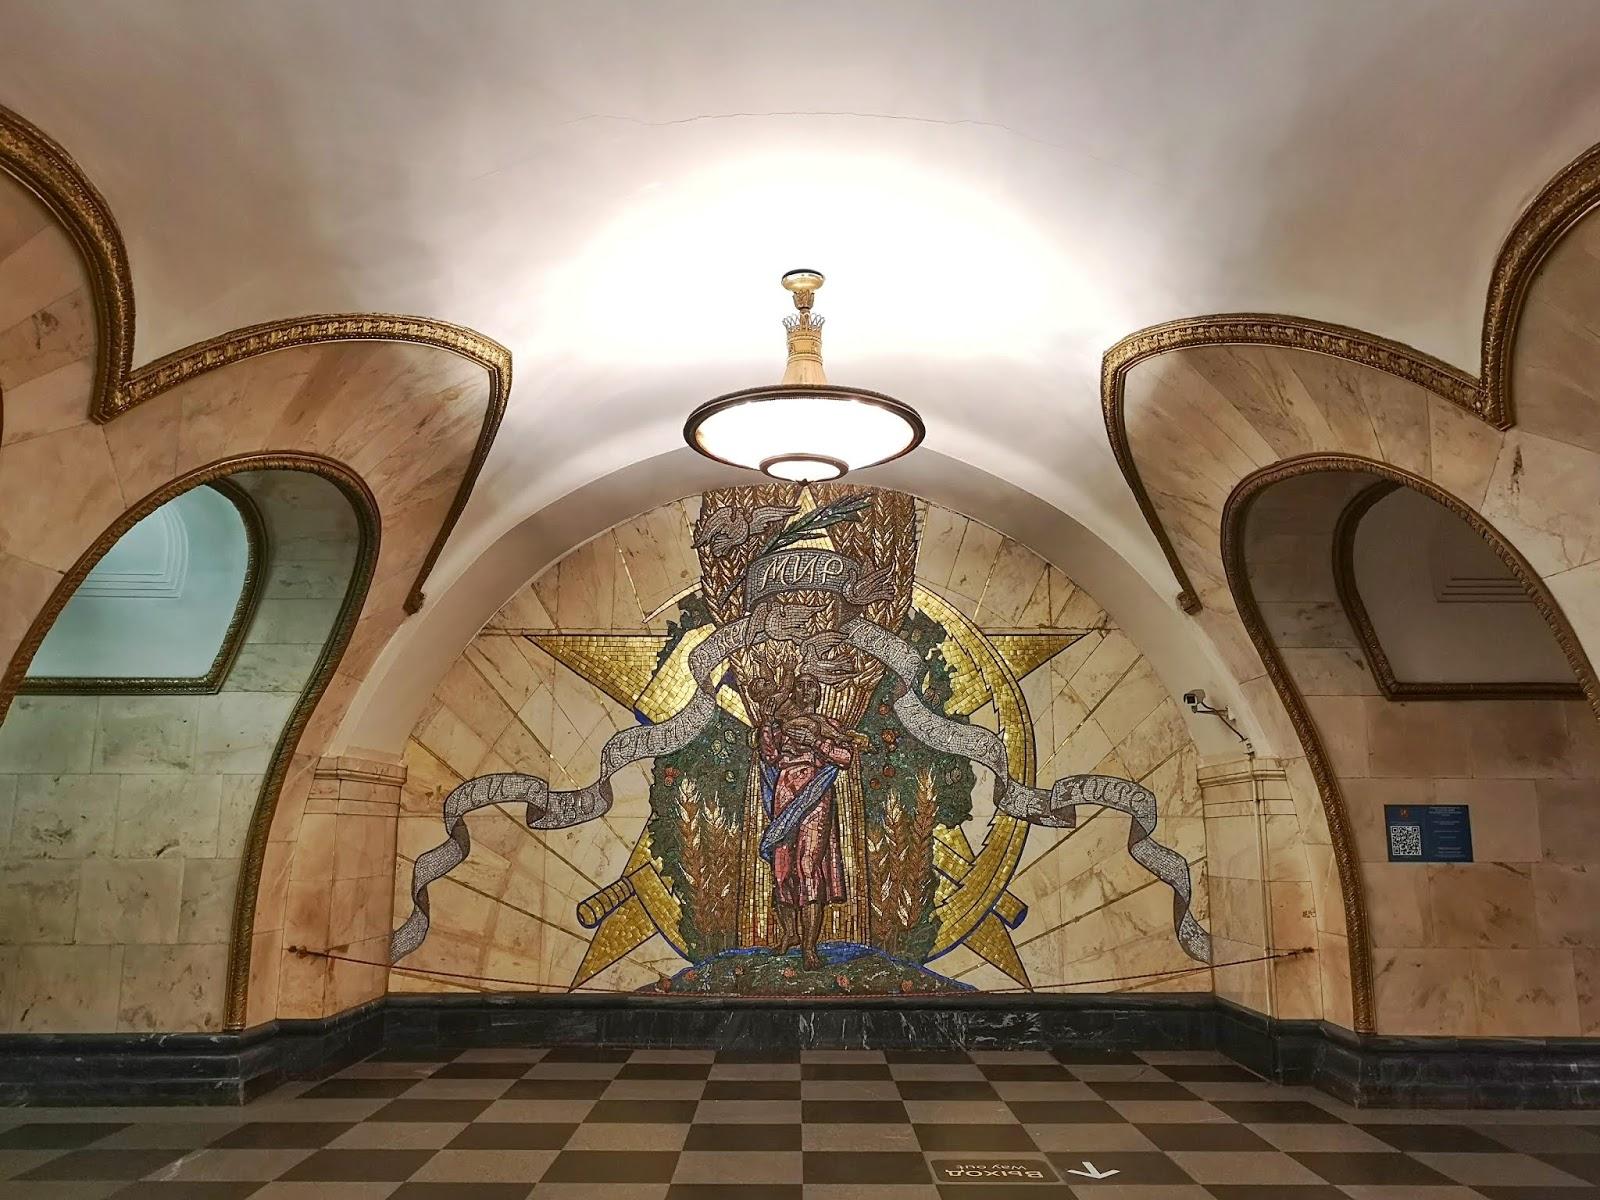 Фото хомяками, открытки метро новослободская